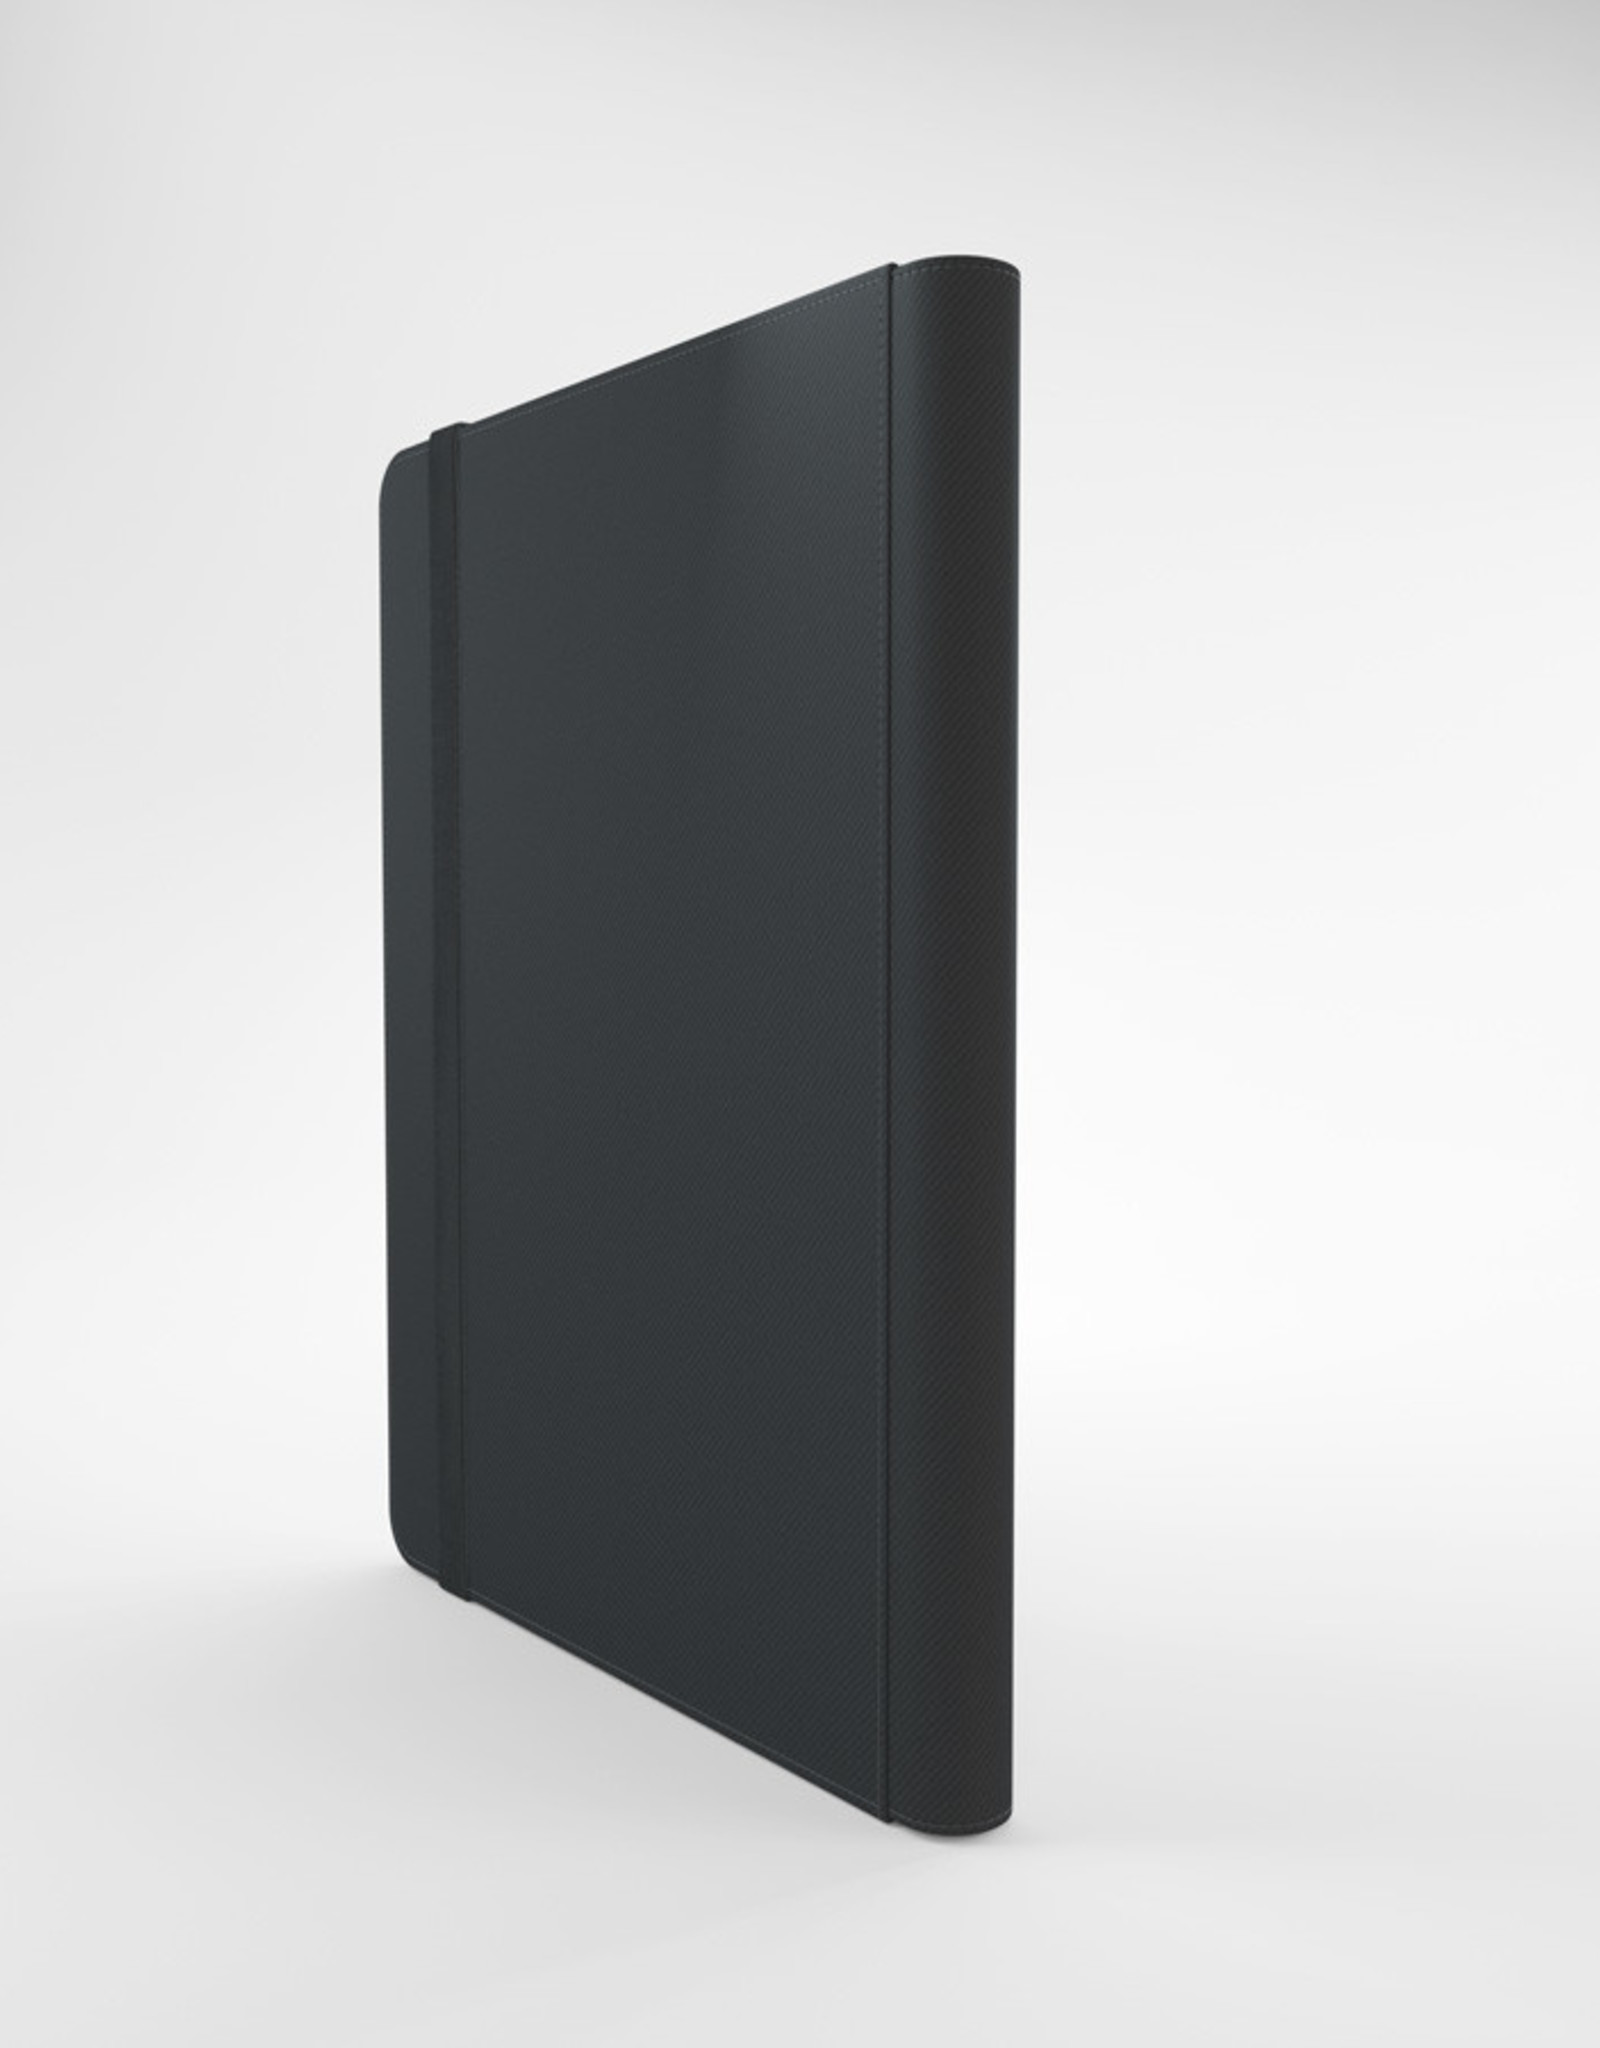 (Reprint Q3 2020) Prime Album: 18-Pocket Black Side-Loading